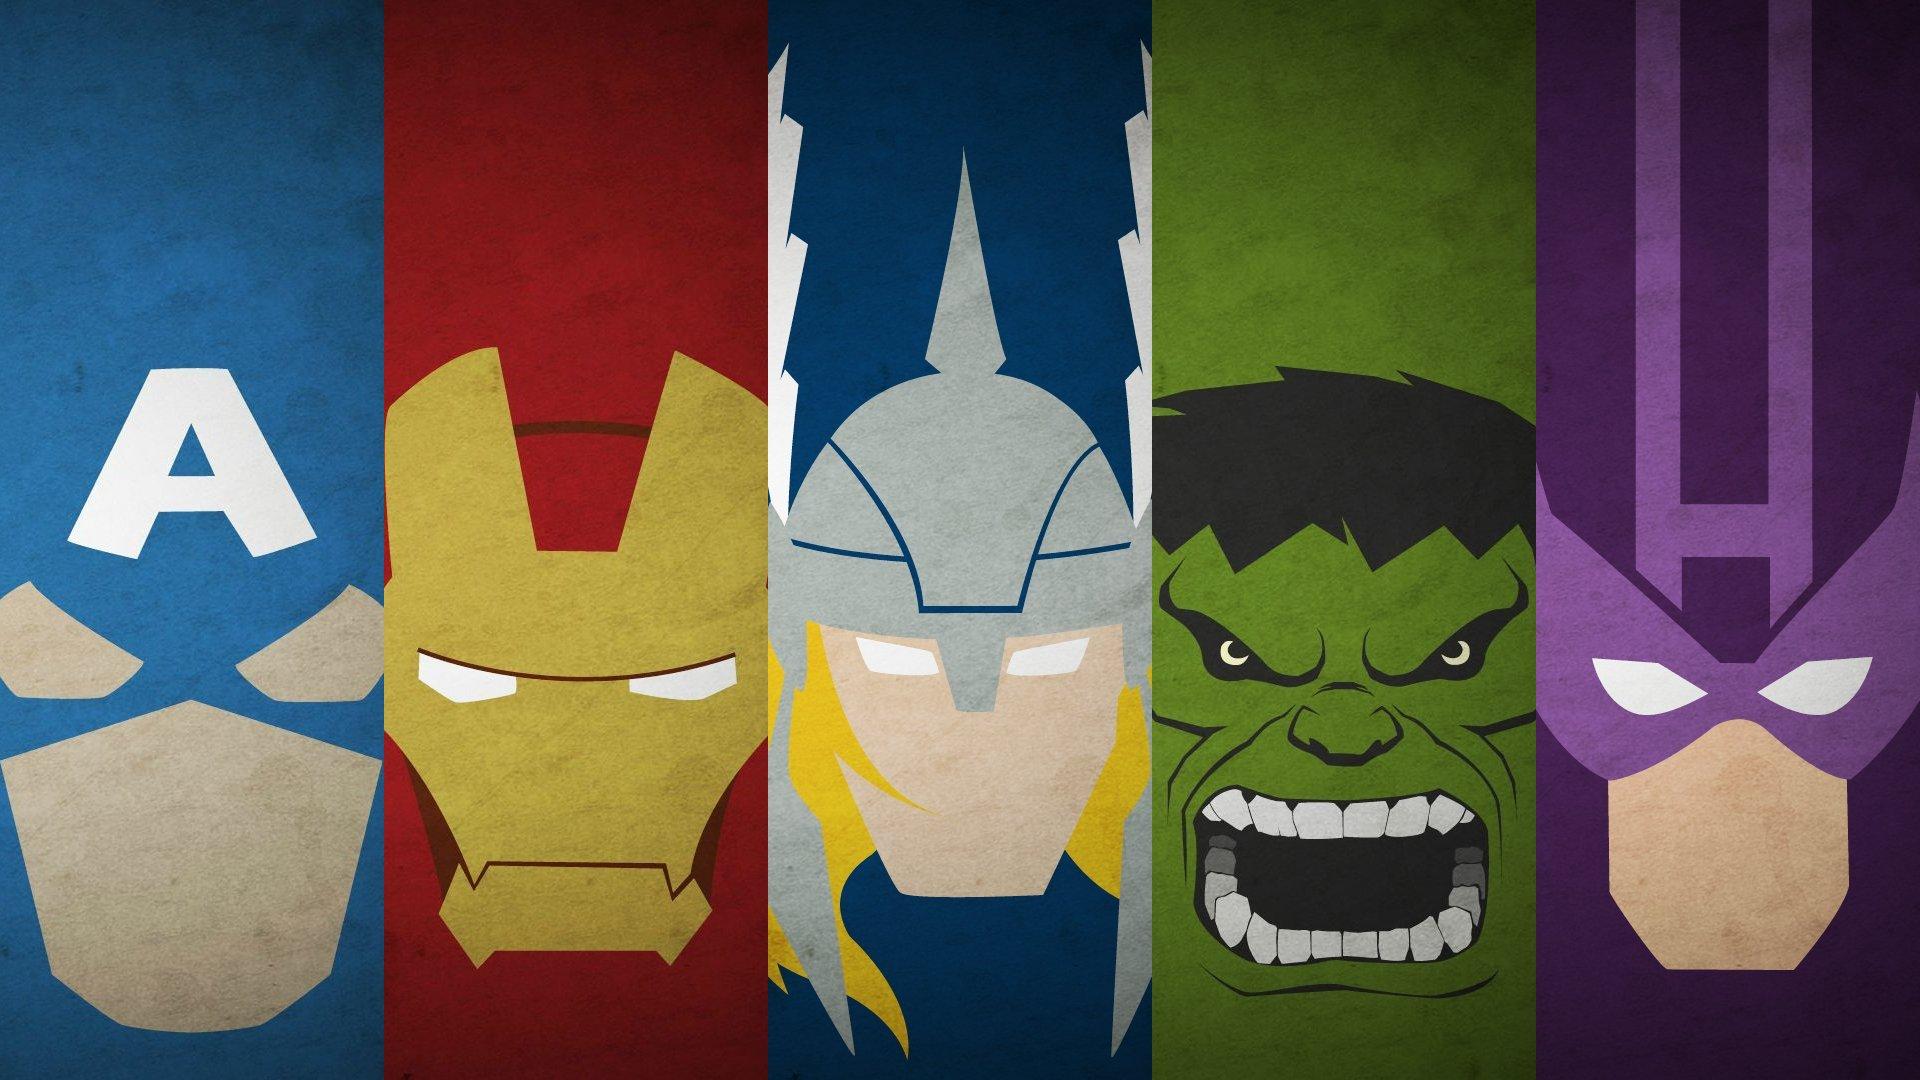 Best Wallpaper Mac Superhero - Avengers-geekdom-39645834-1920-1080  2018_477534.jpg